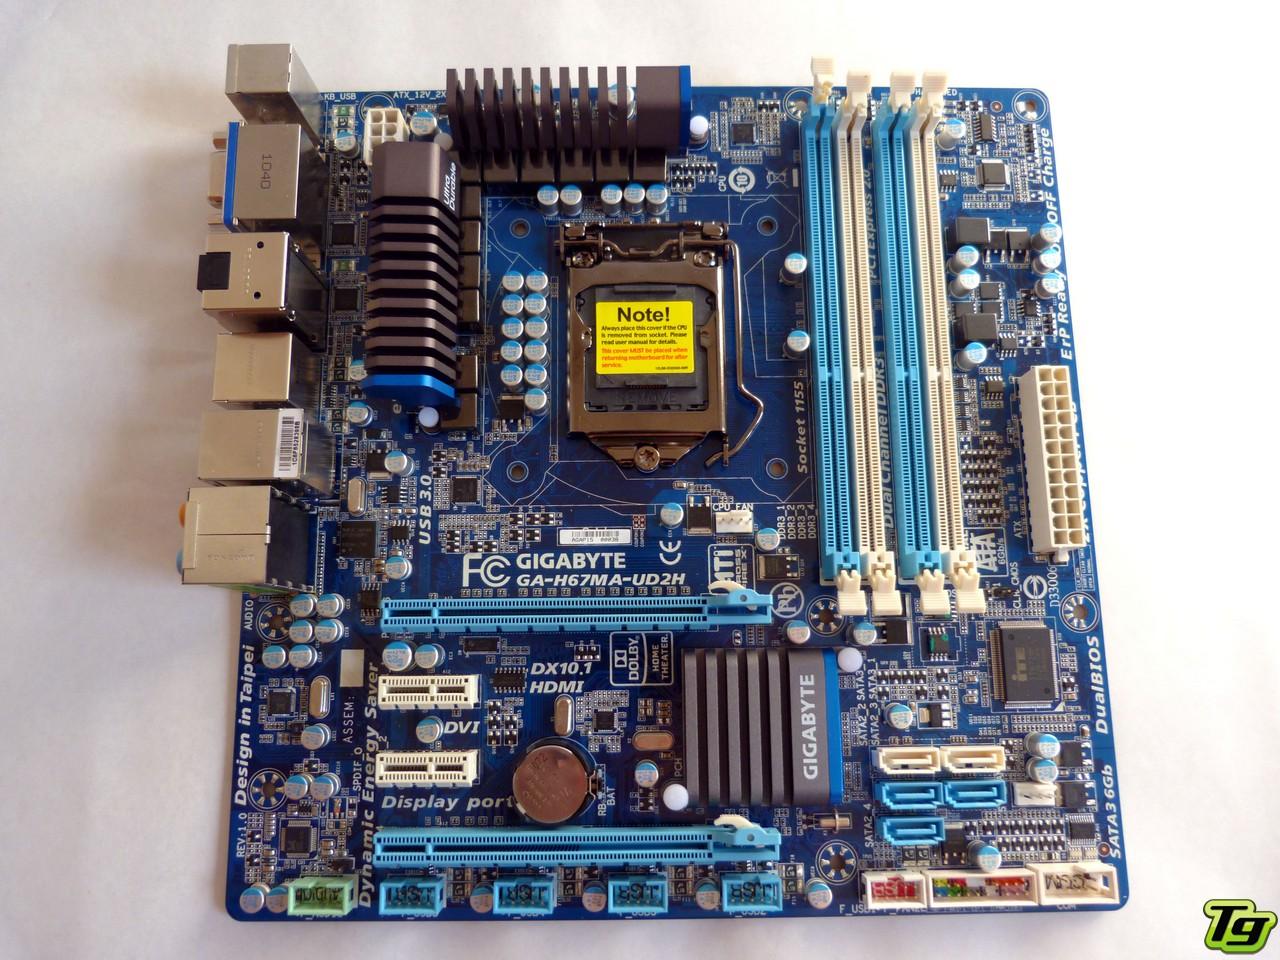 Gigabyte GA-H67MA-UD2H NEC USB 3.0 Driver for PC